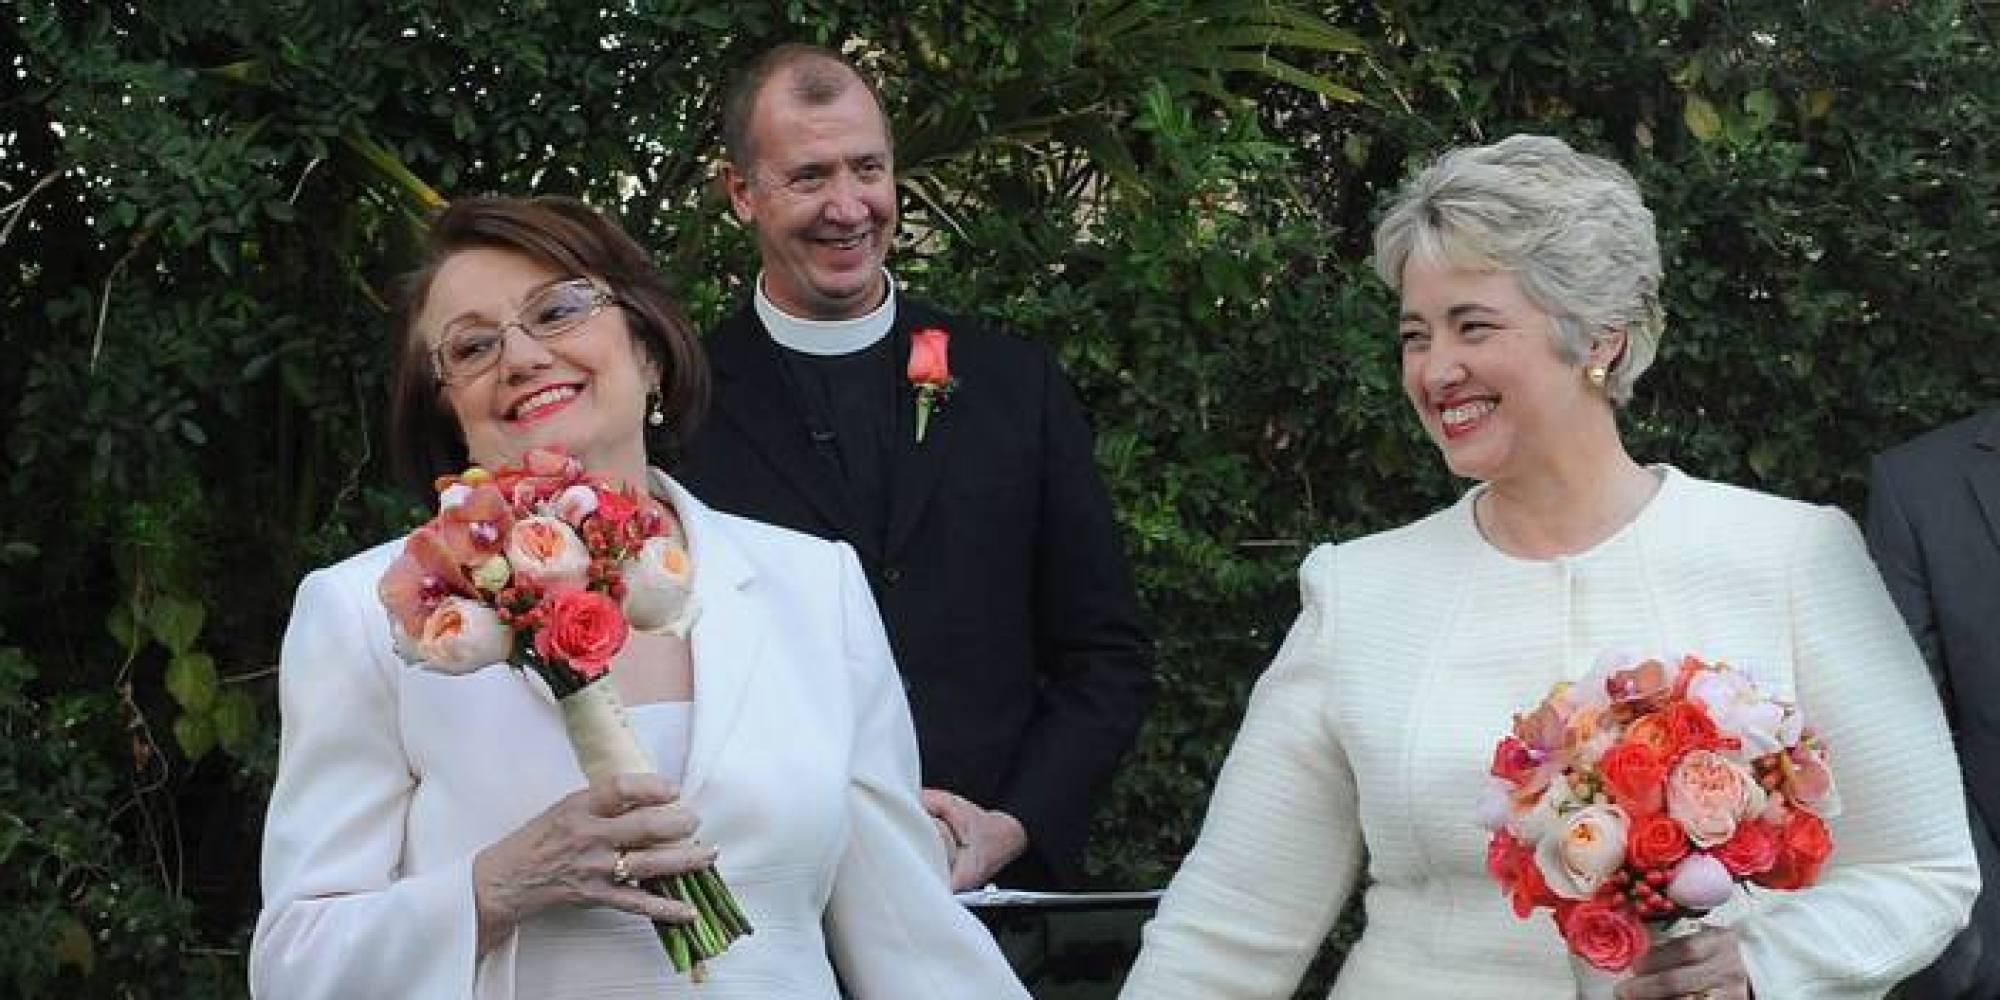 gay mariage in canada